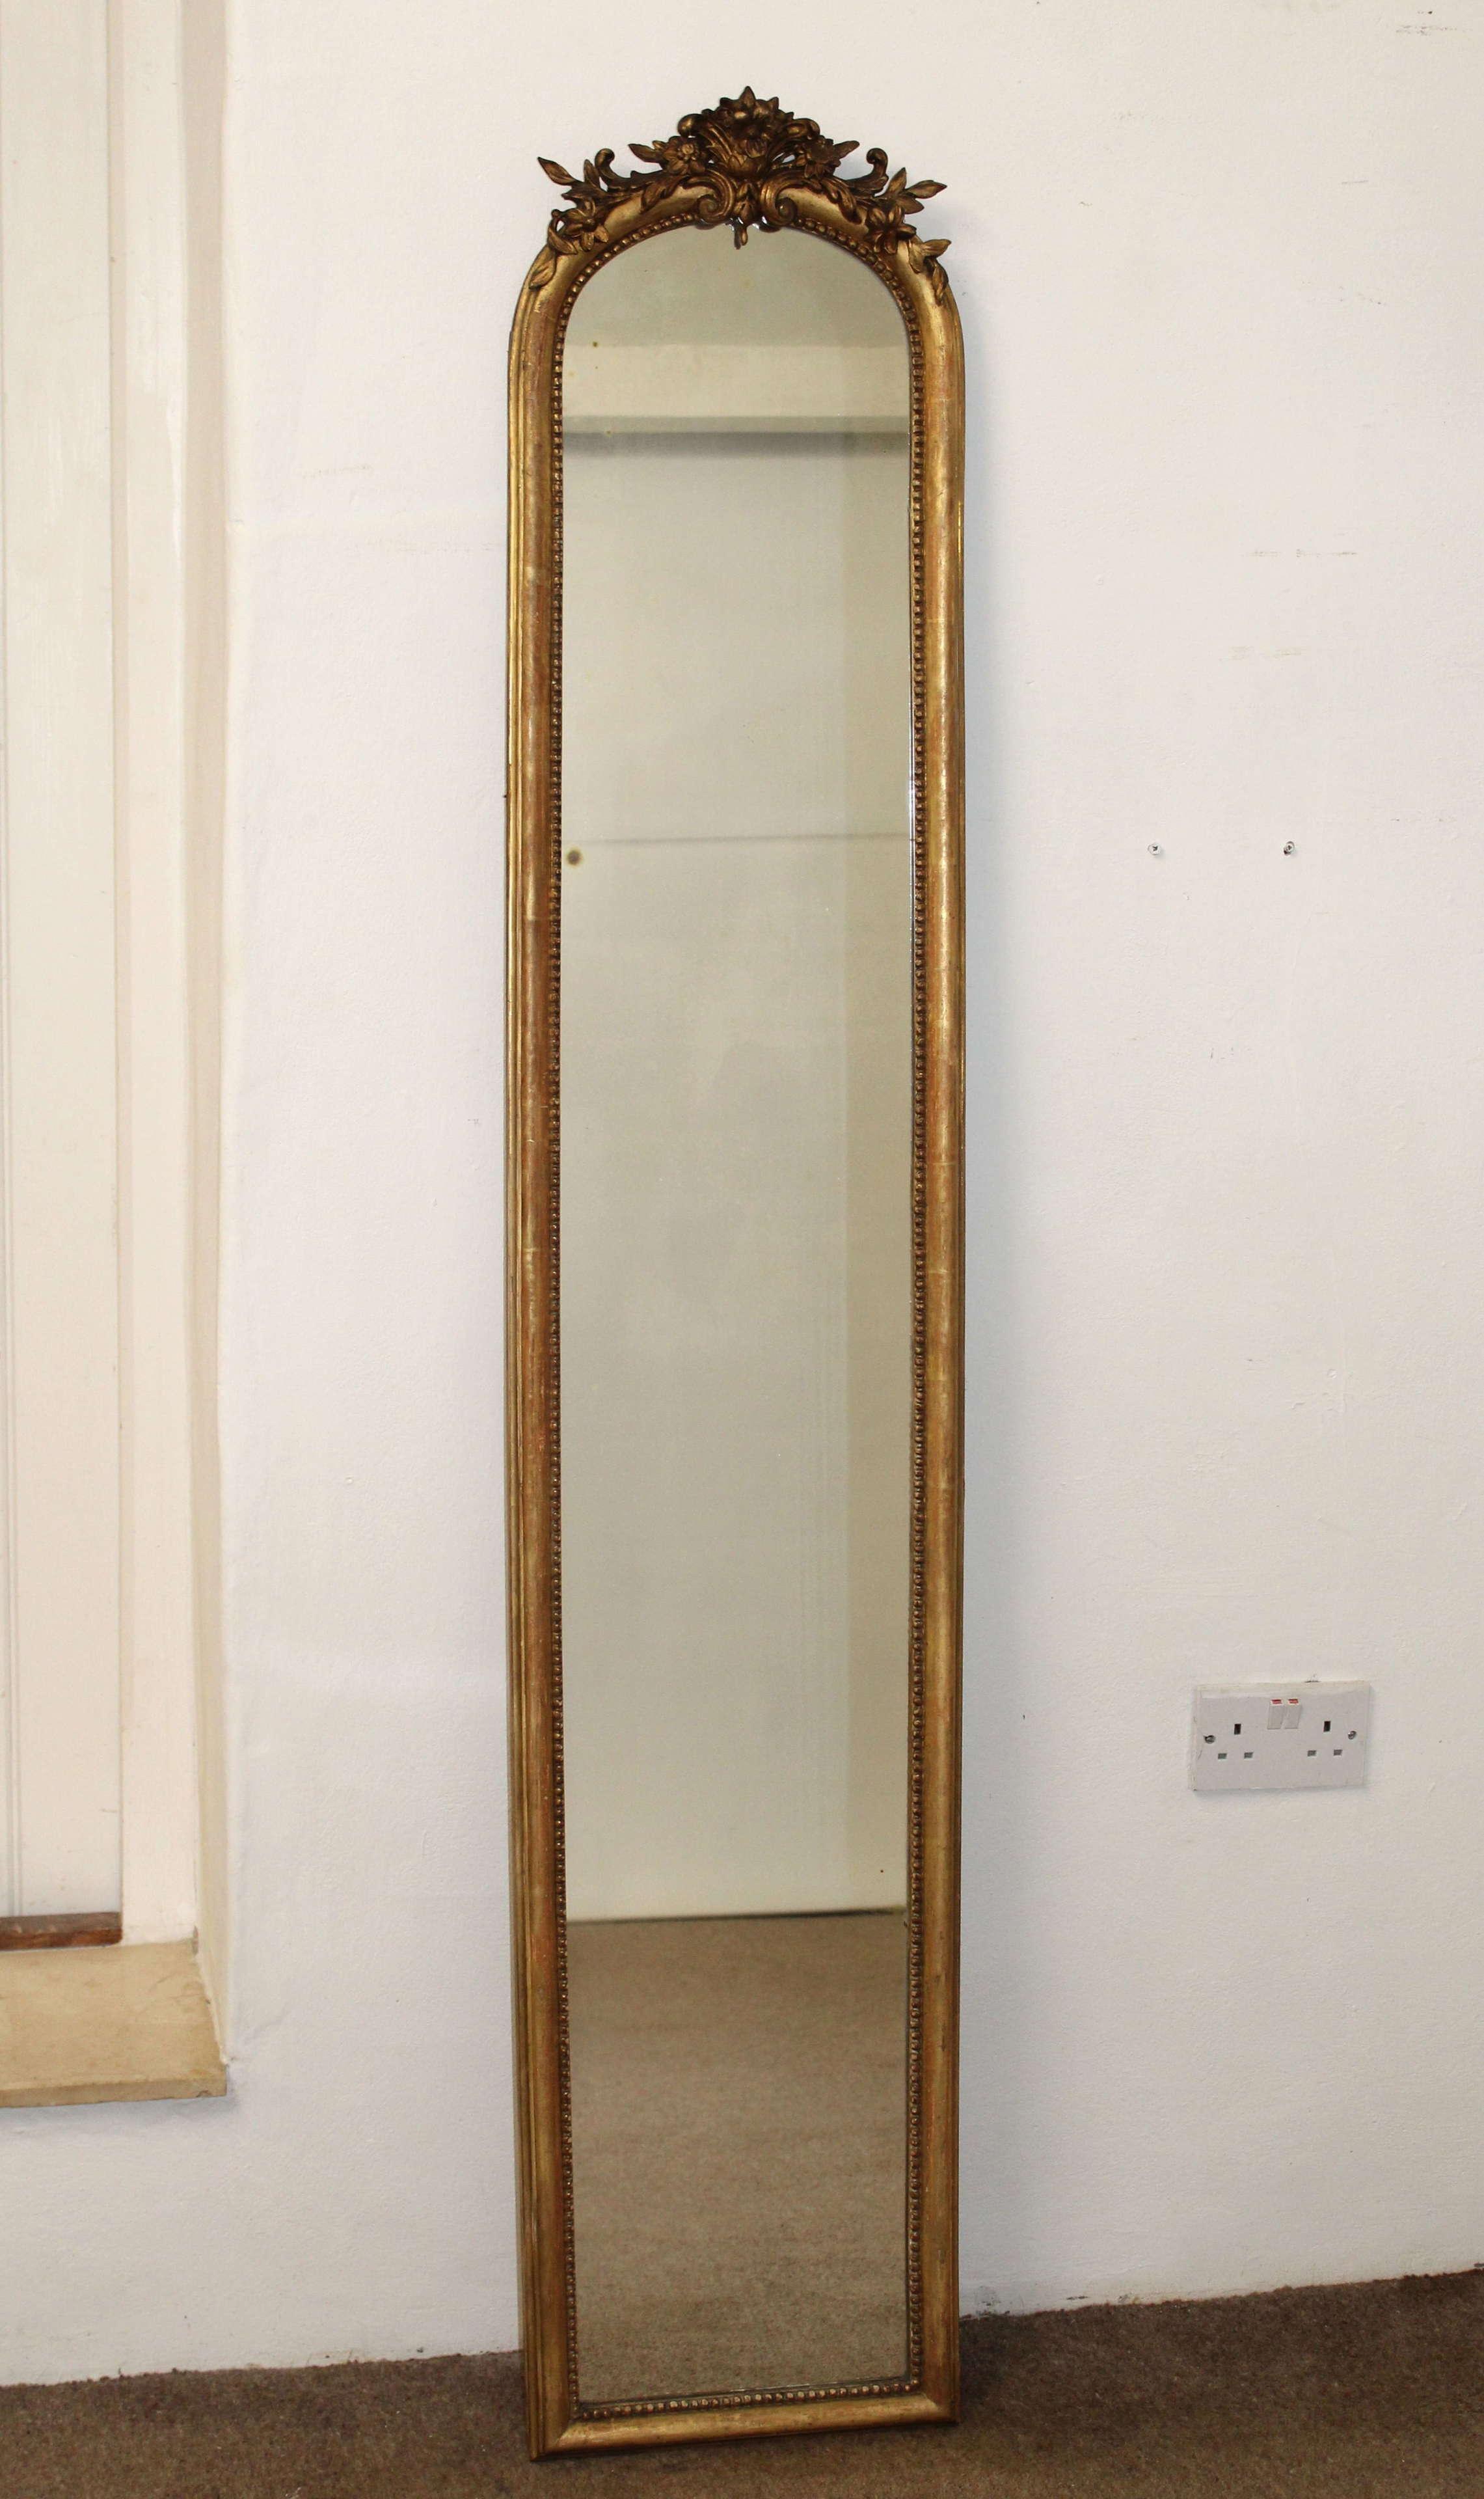 Tall, narrow, antique mirror with cartouche